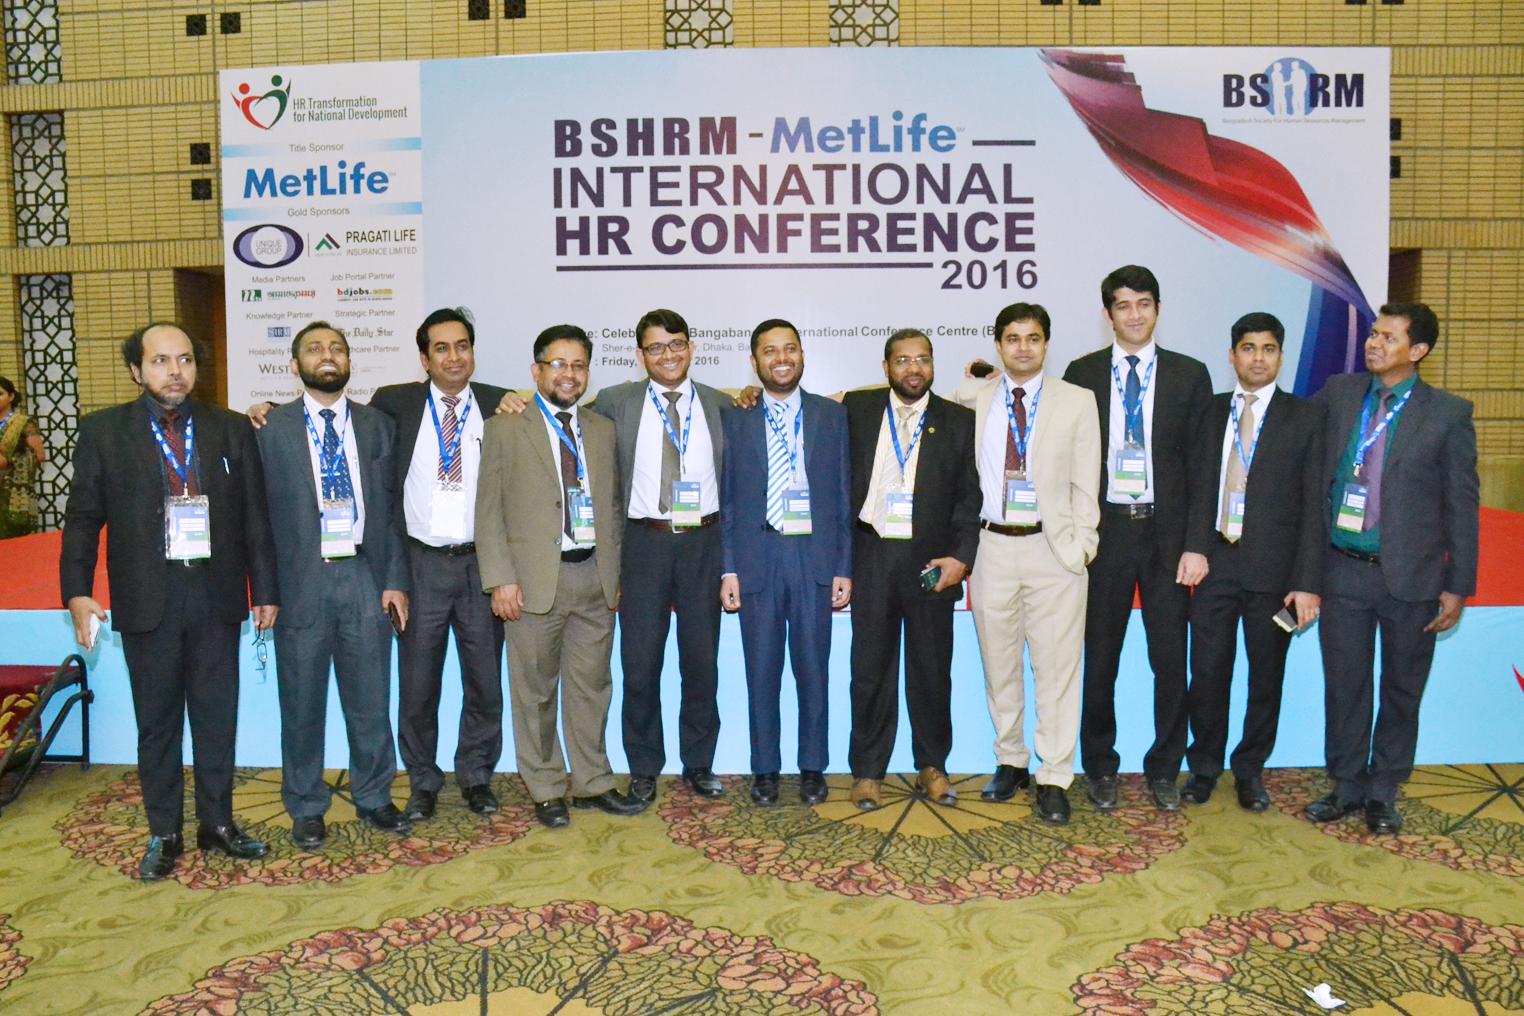 BSHRM - Bangladesh Society For Human Resources Management